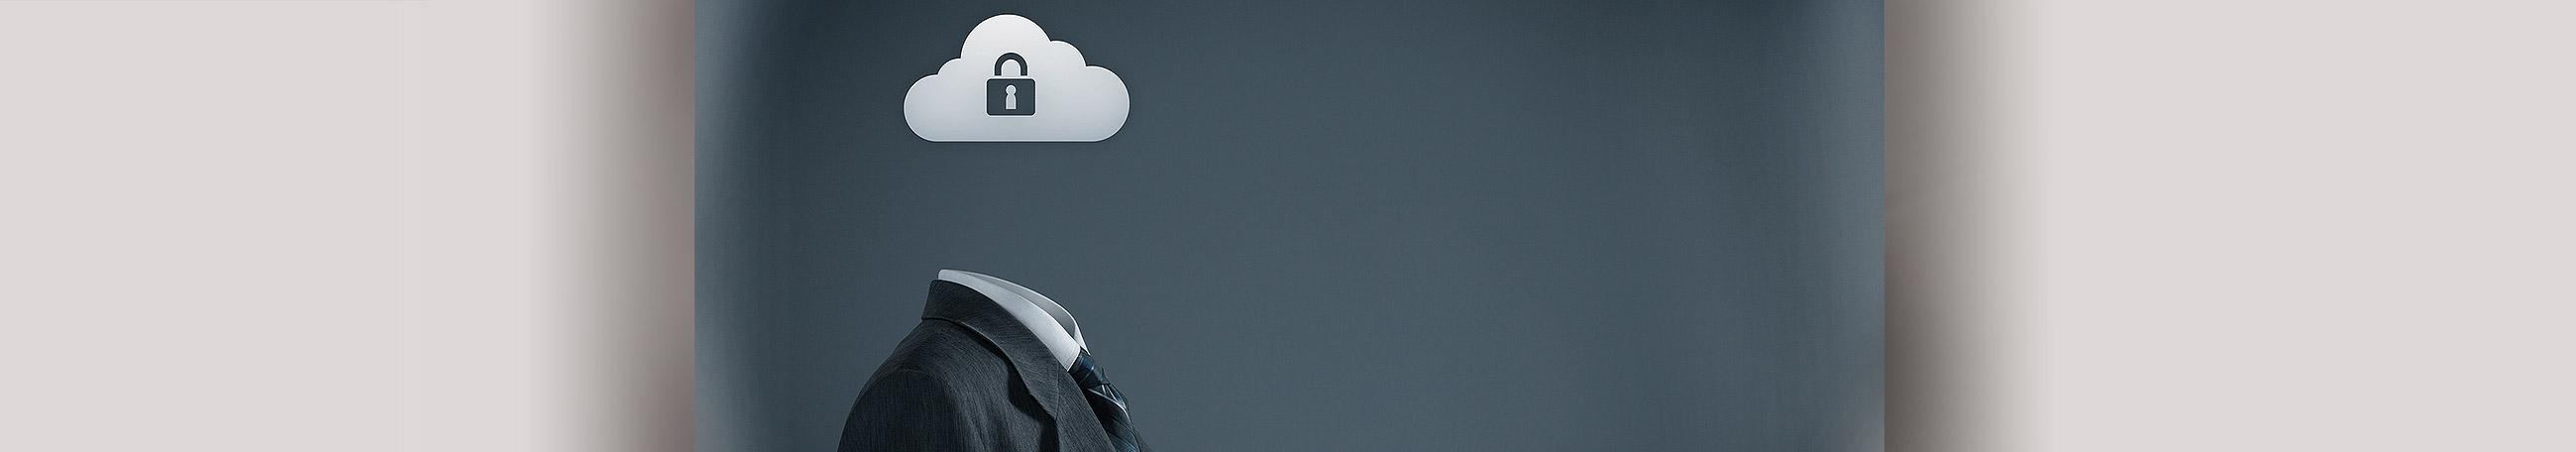 slider-bg-1-cloud-accounting